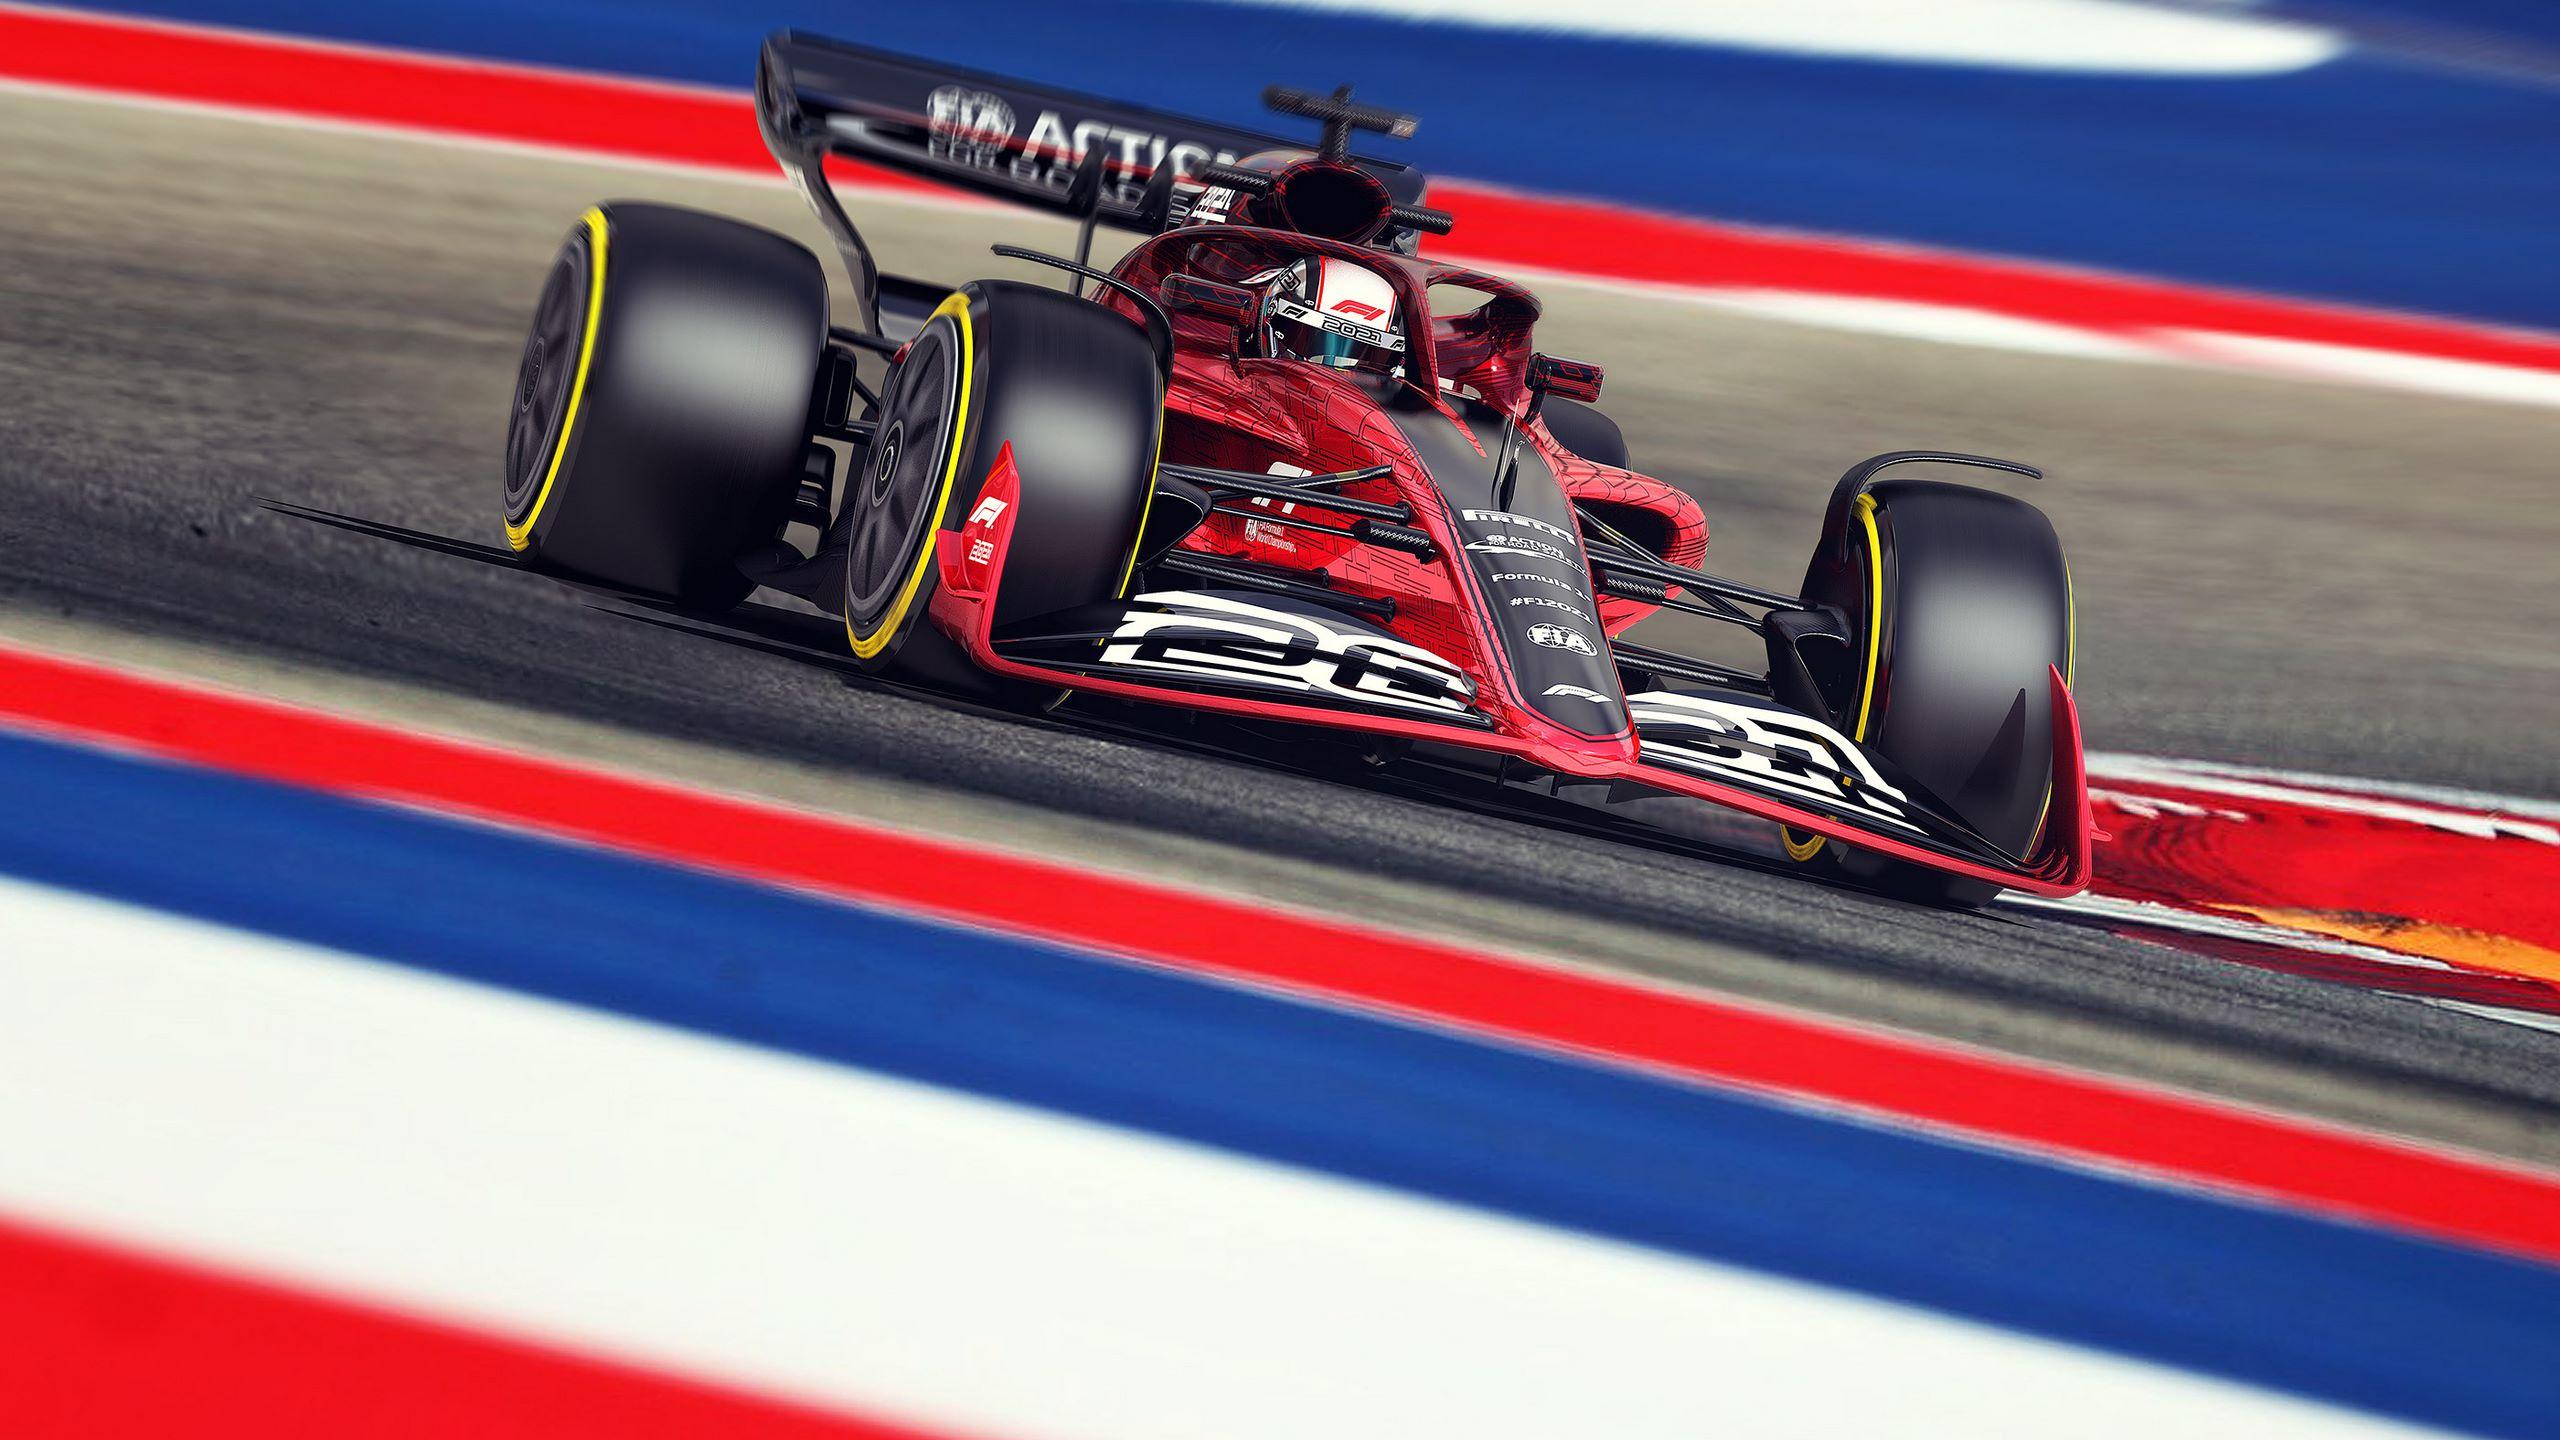 2021-formula-1-race-car-rendering f1 (11)